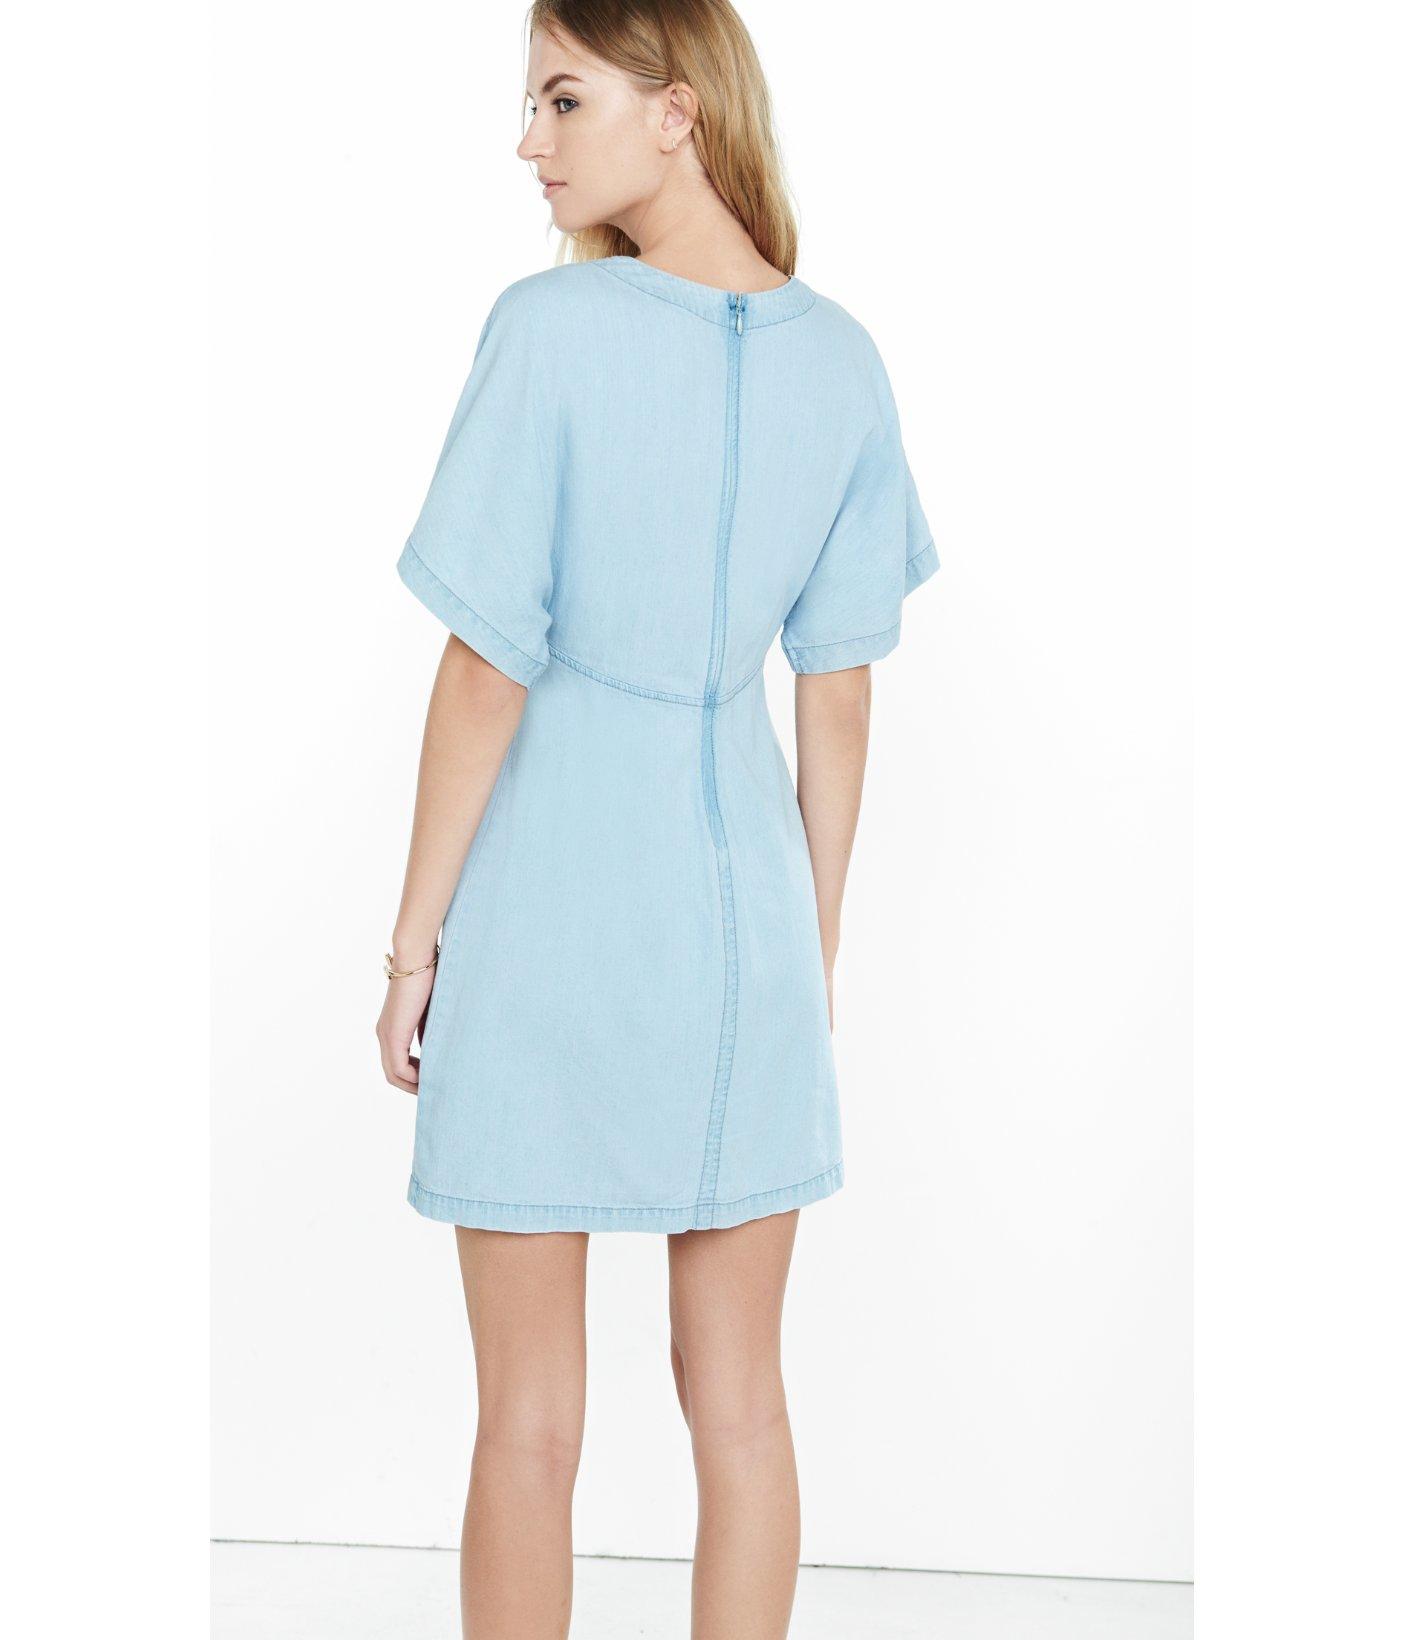 7f84516797 Lyst - Express Denim Short Kimono Sleeve Dress in Blue